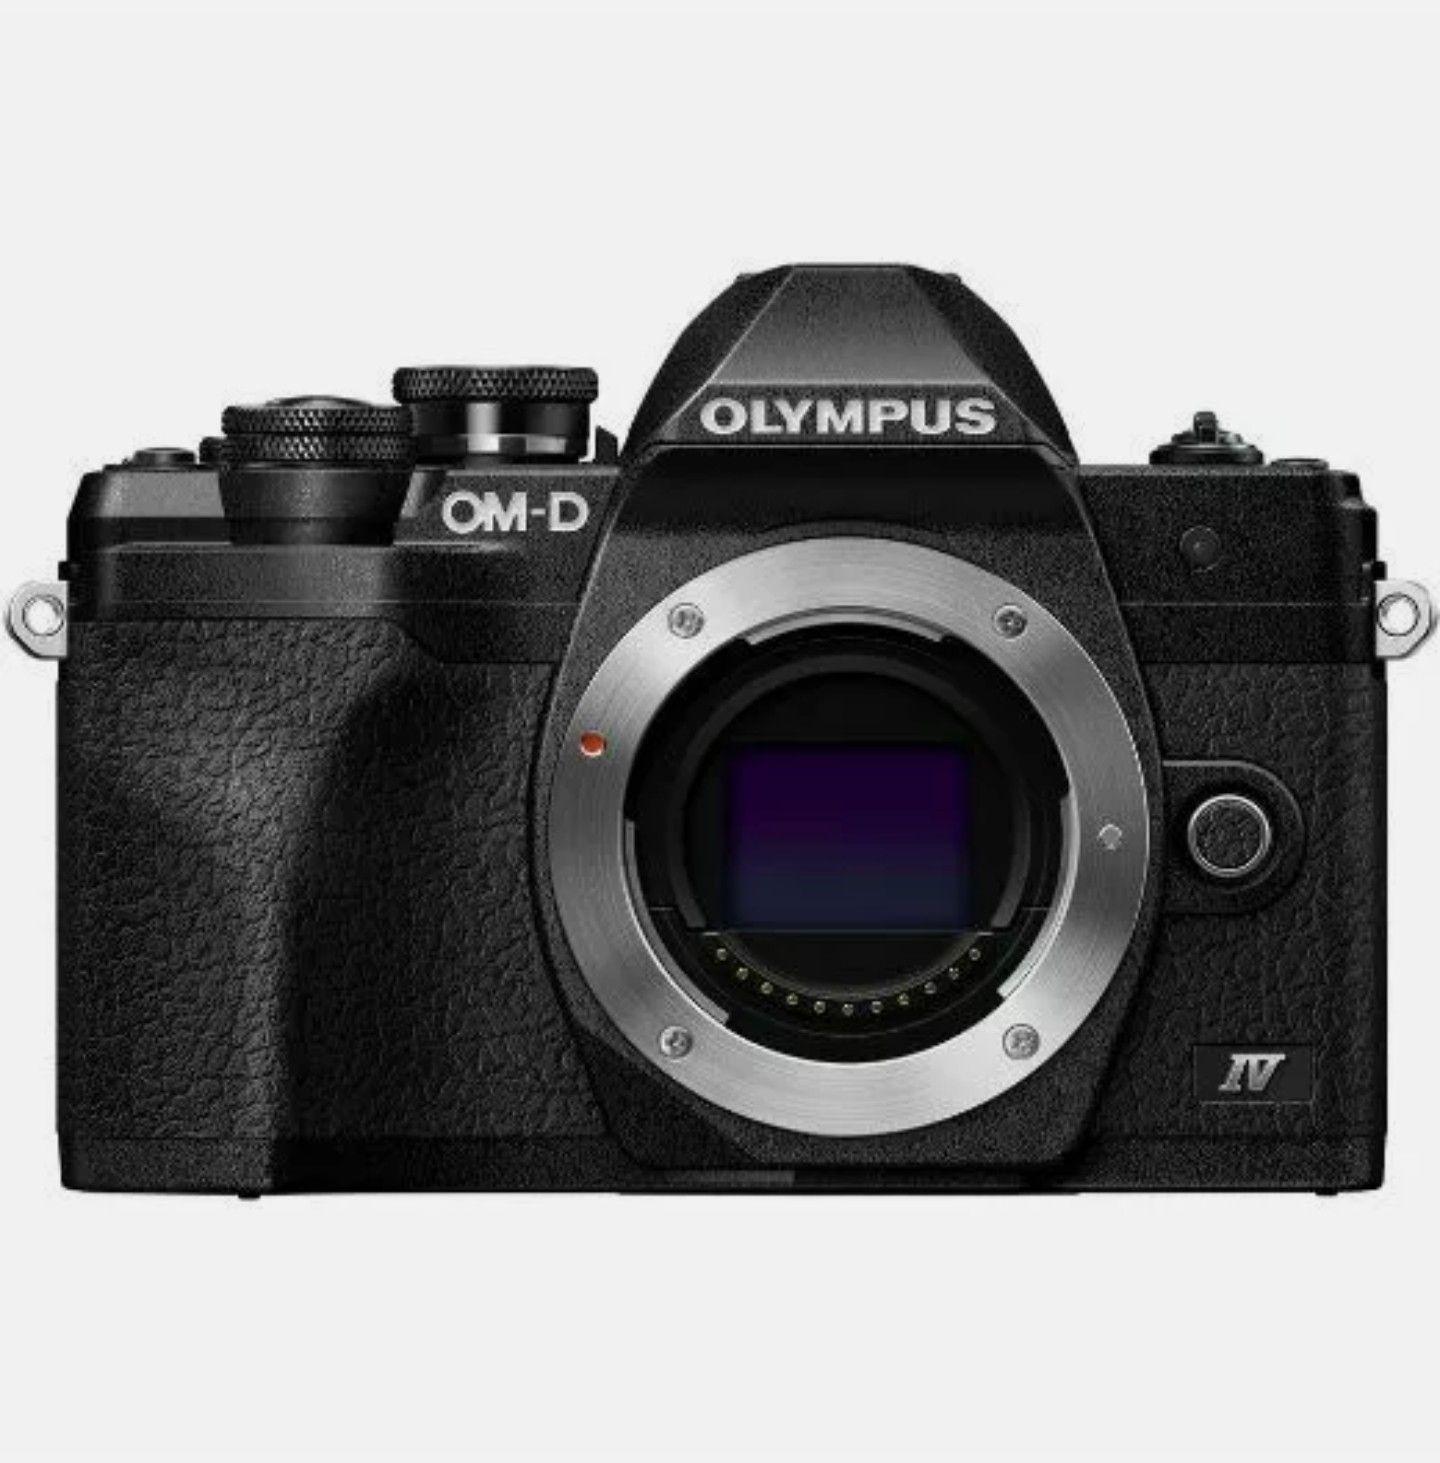 A - Olympus OM-D E-M10 Mark IV Digital Camera Body Black - Opened never used £489 @ cameracentreuk eBay